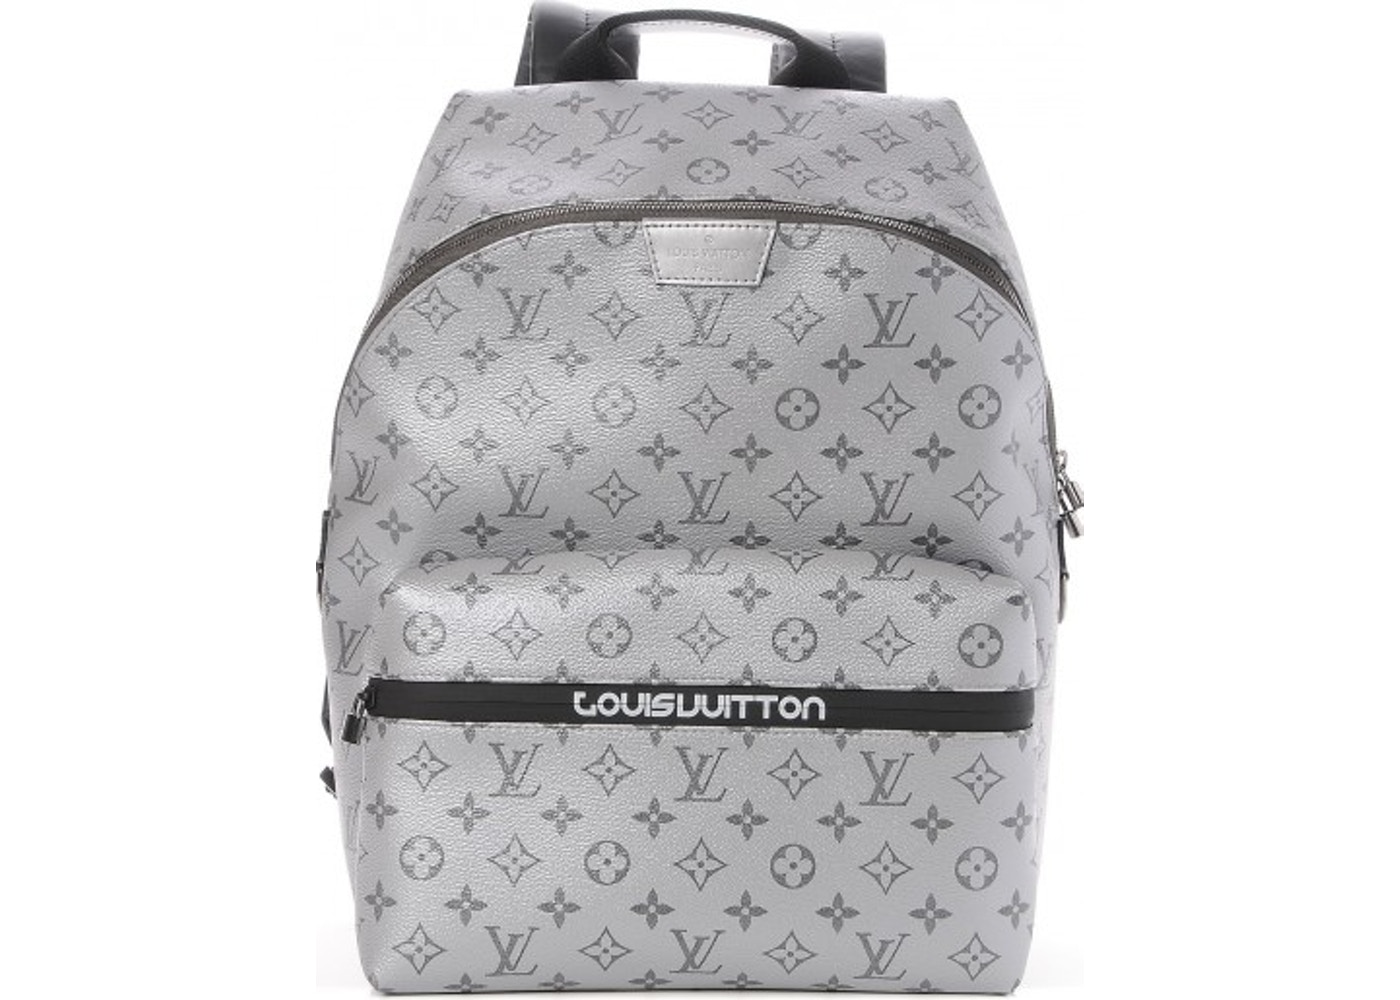 4ca74518f815 Louis Vuitton Backpack Apollo Outdoor Monogram Reflect Silver Black.  Monogram Reflect Silver Black